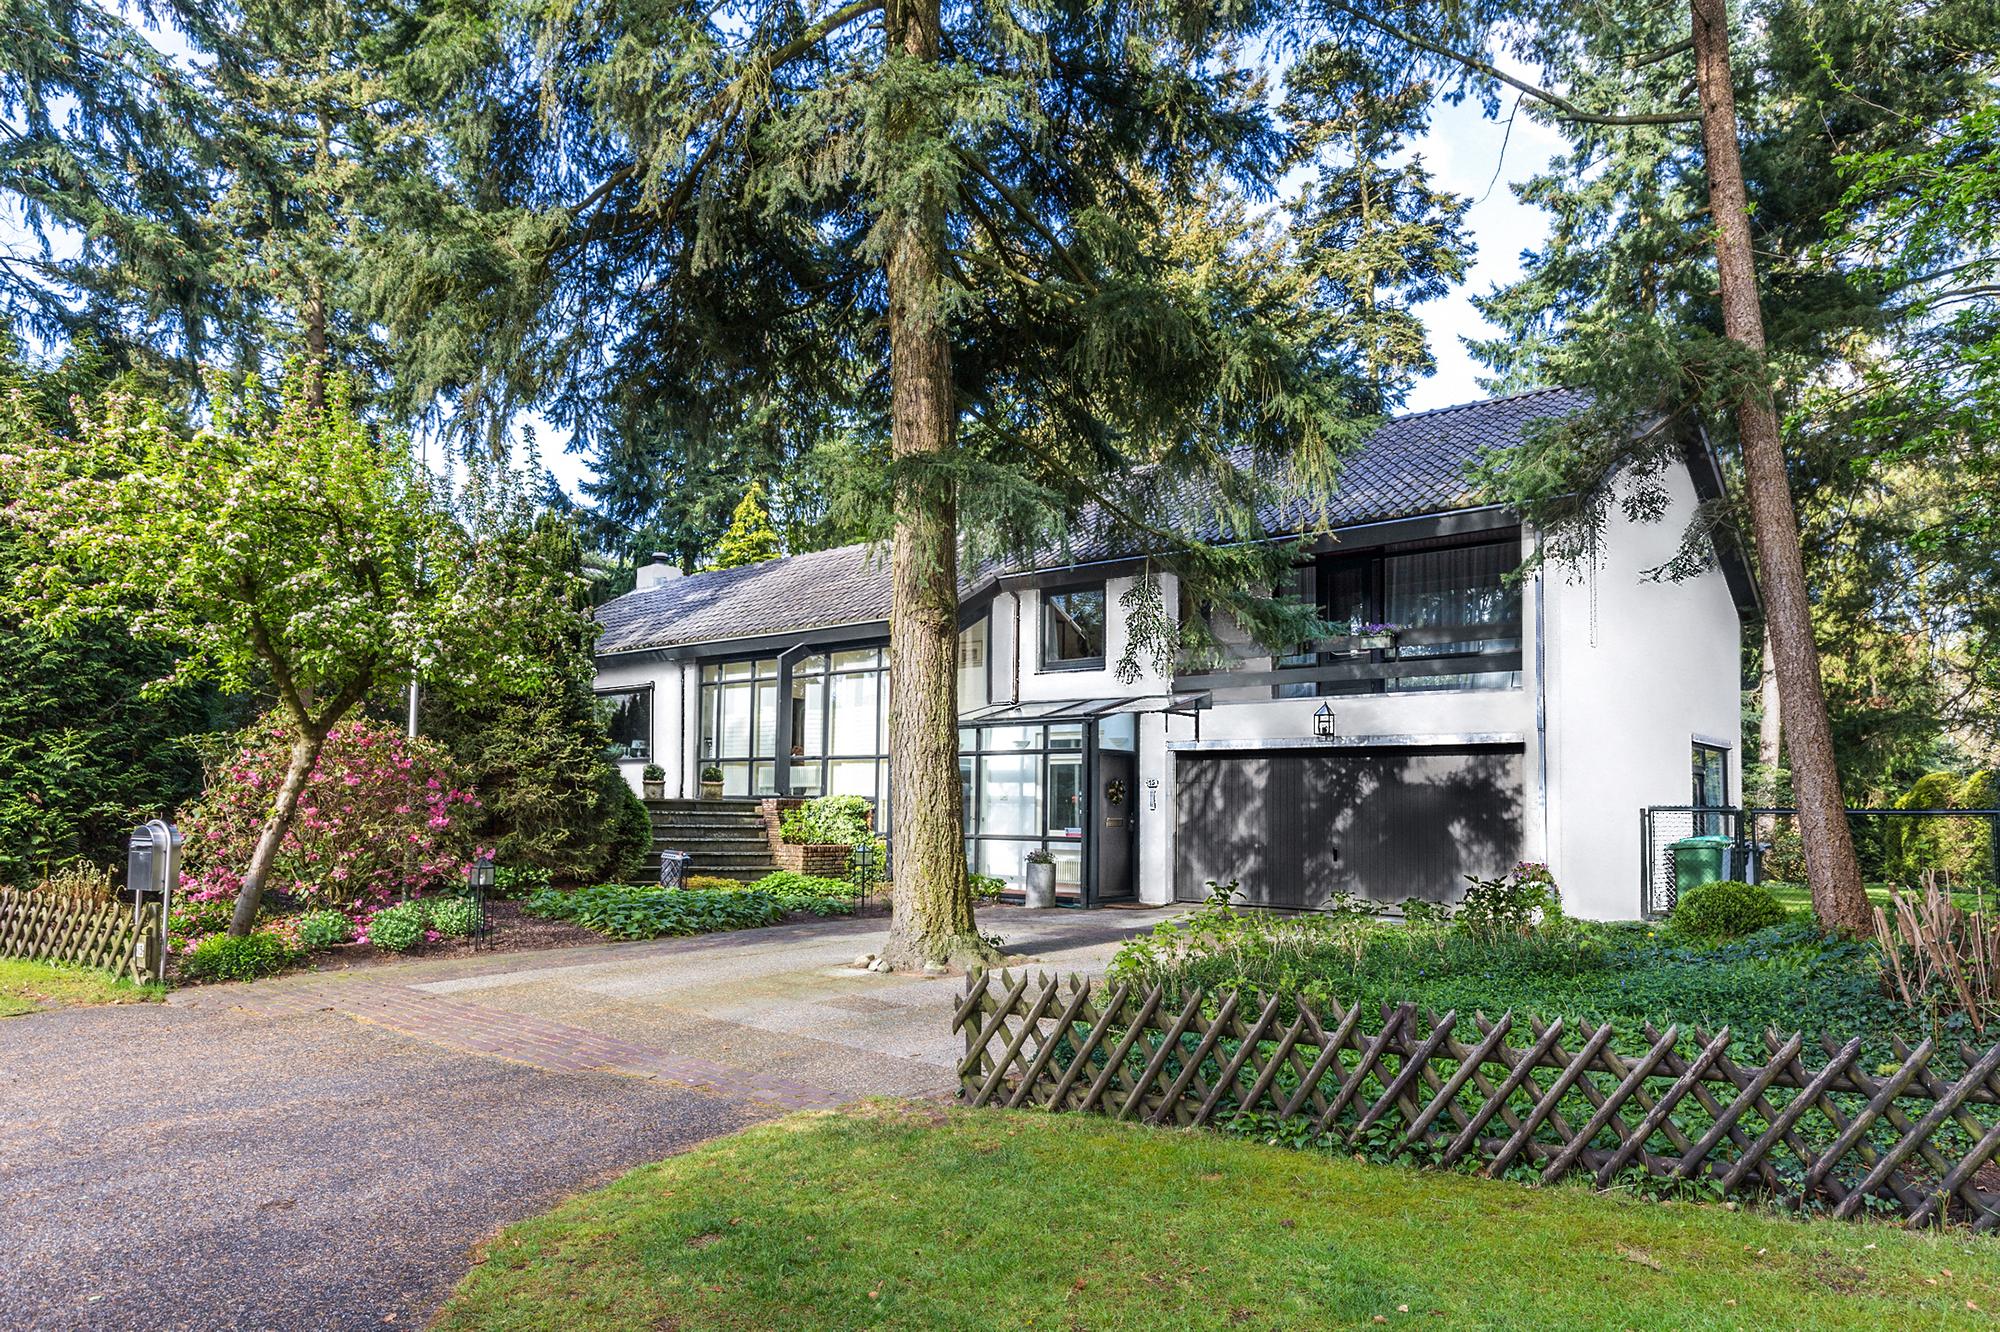 Casa exterior arquitetura marketing imobiliario Signimo fotografia drone